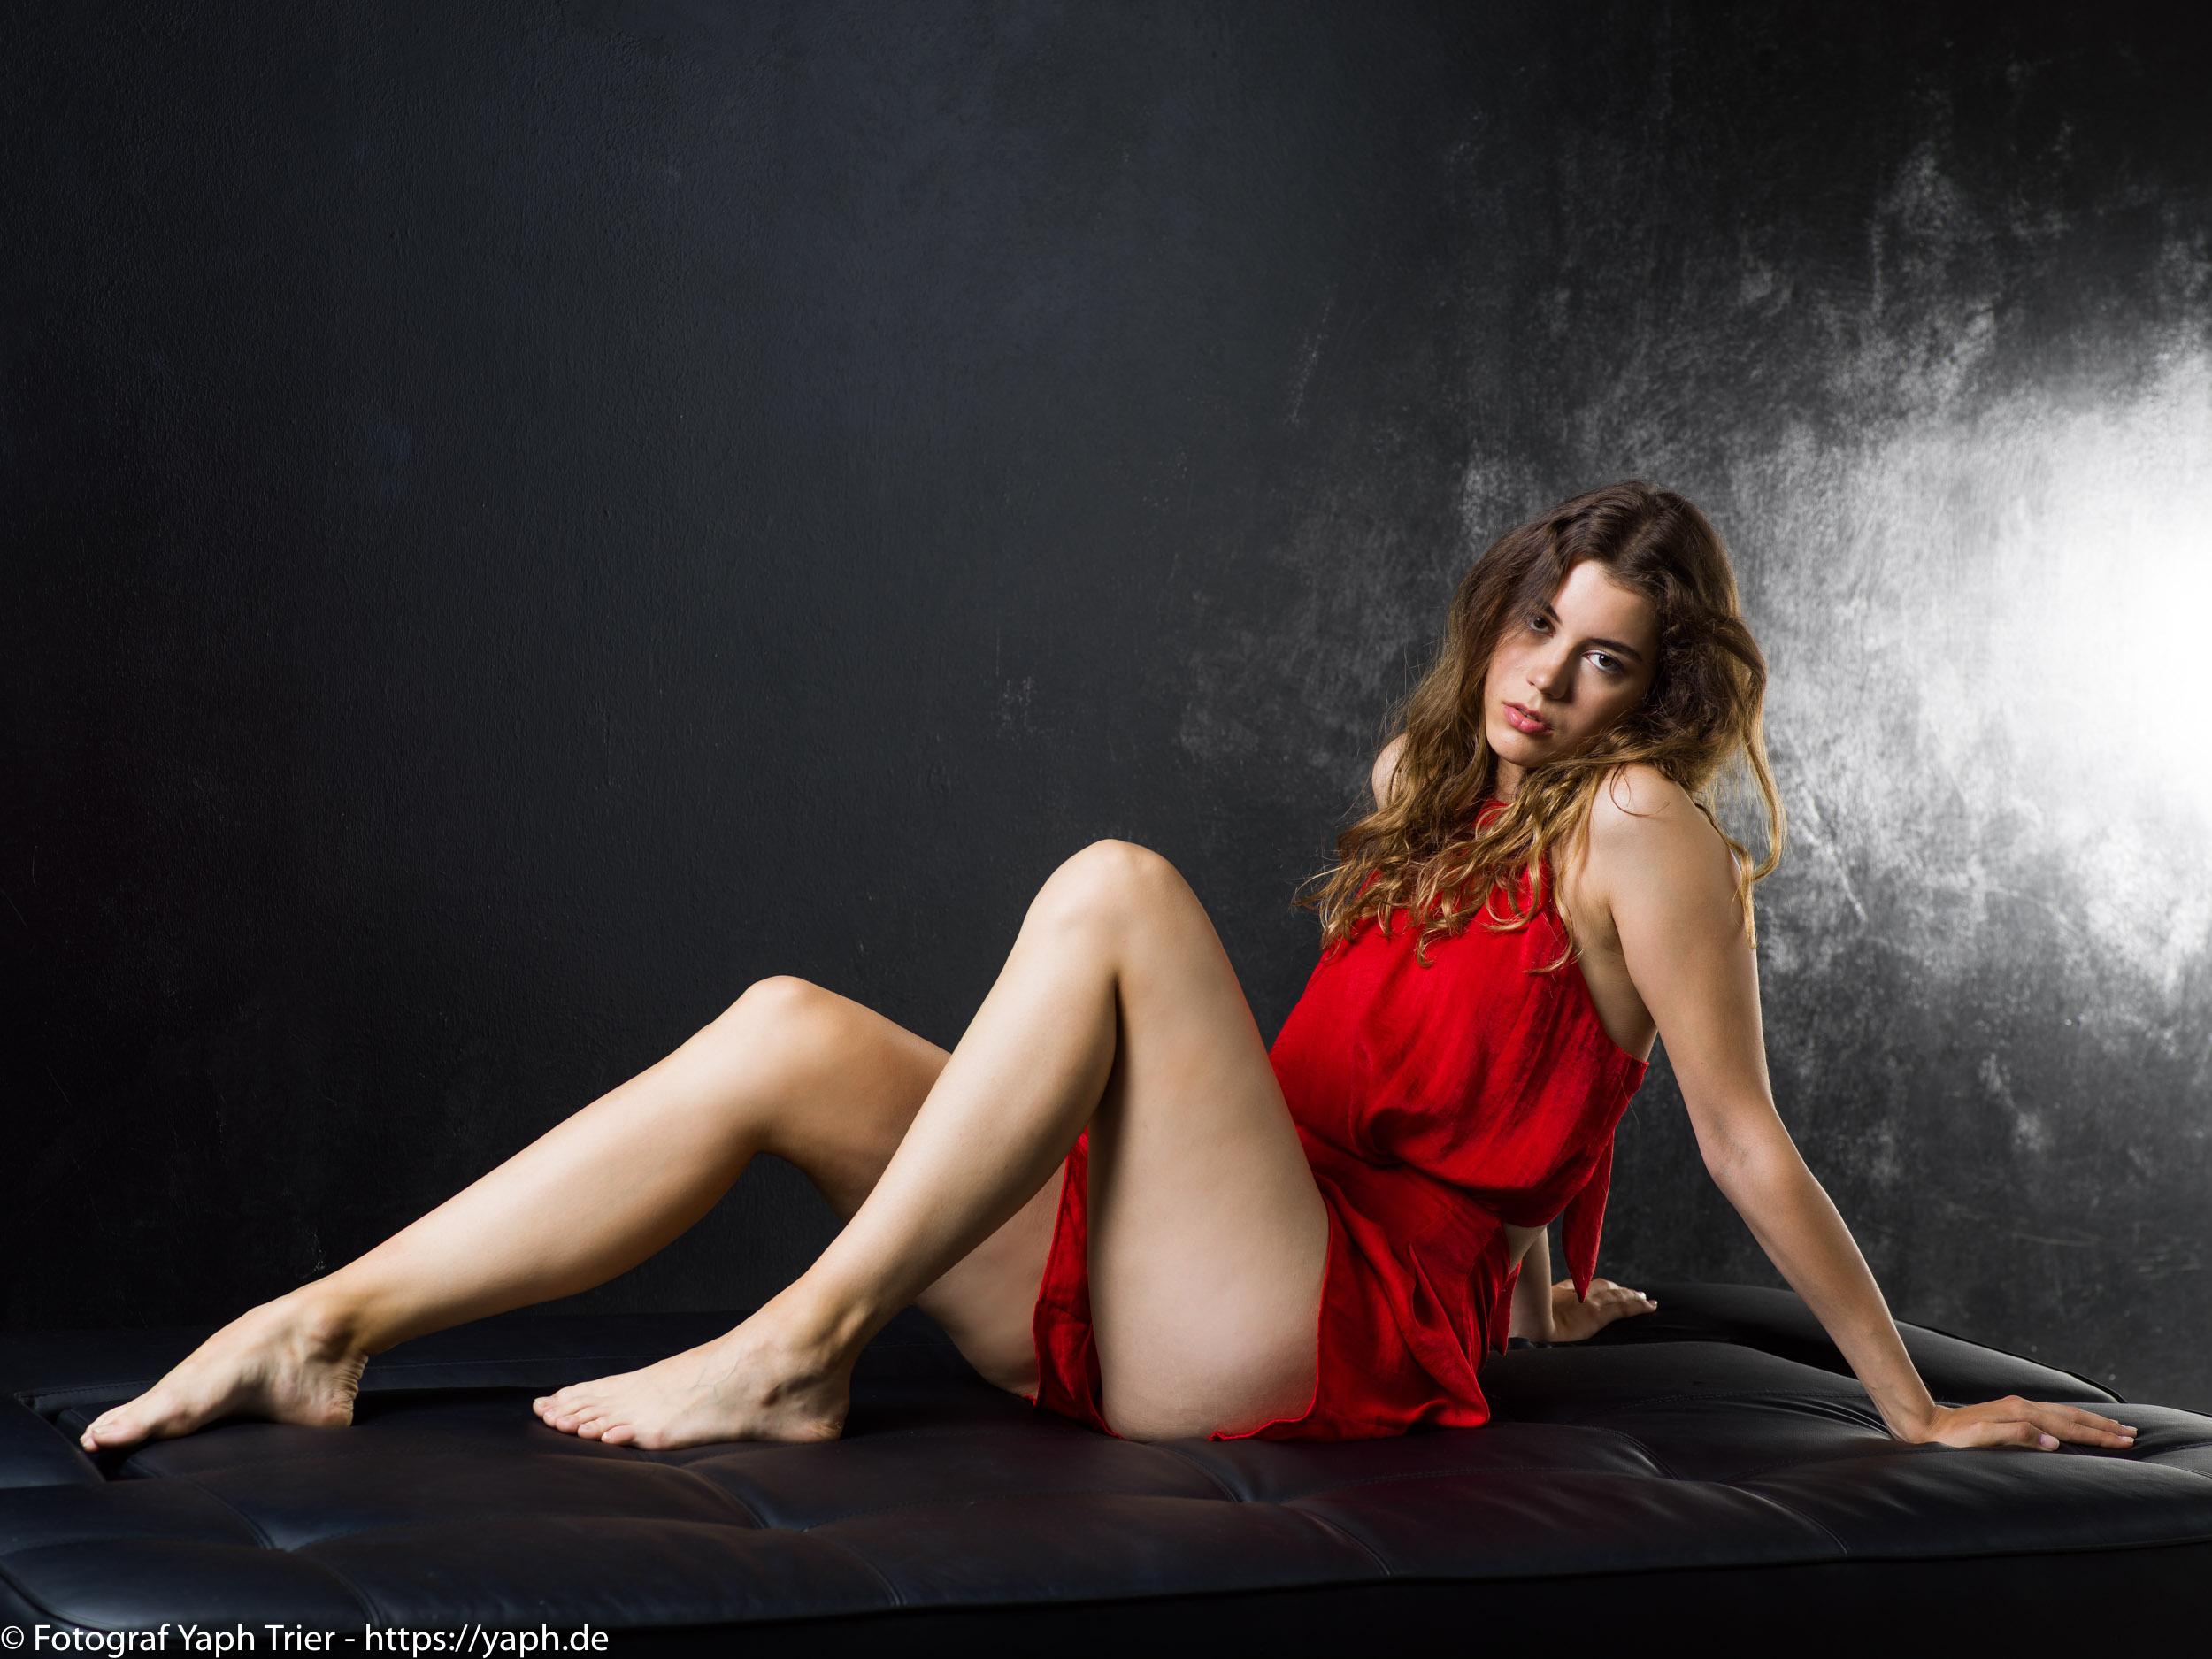 Portrait Fotoshooting Chiara bei Fotograf Trier Yaph